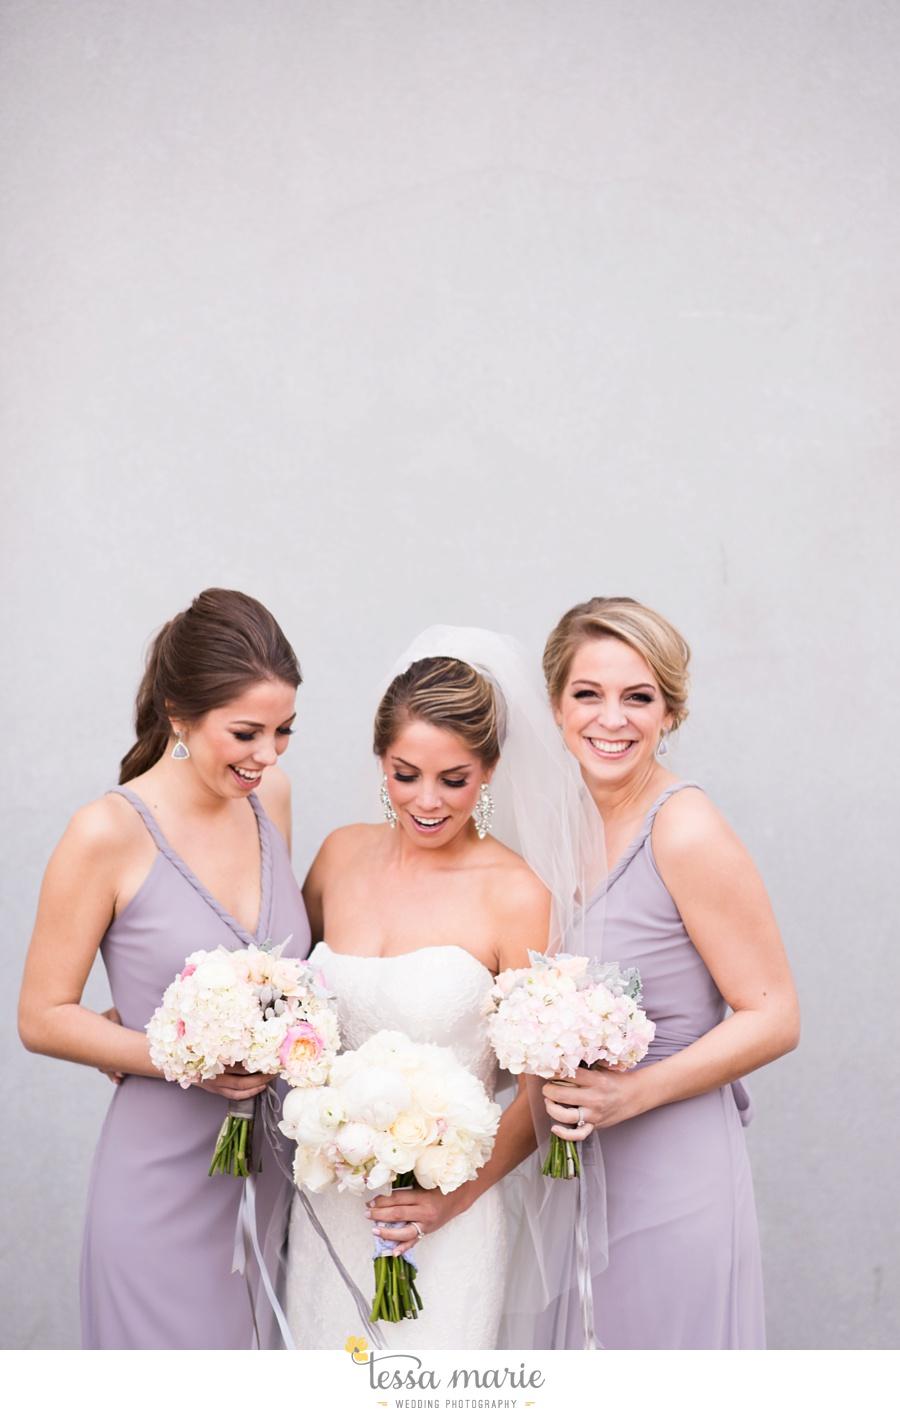 160_tessa_marie_weddings_emotional_moments_photography_king_low_wedding_sam_neil_best_atlanta_wedding_photographer